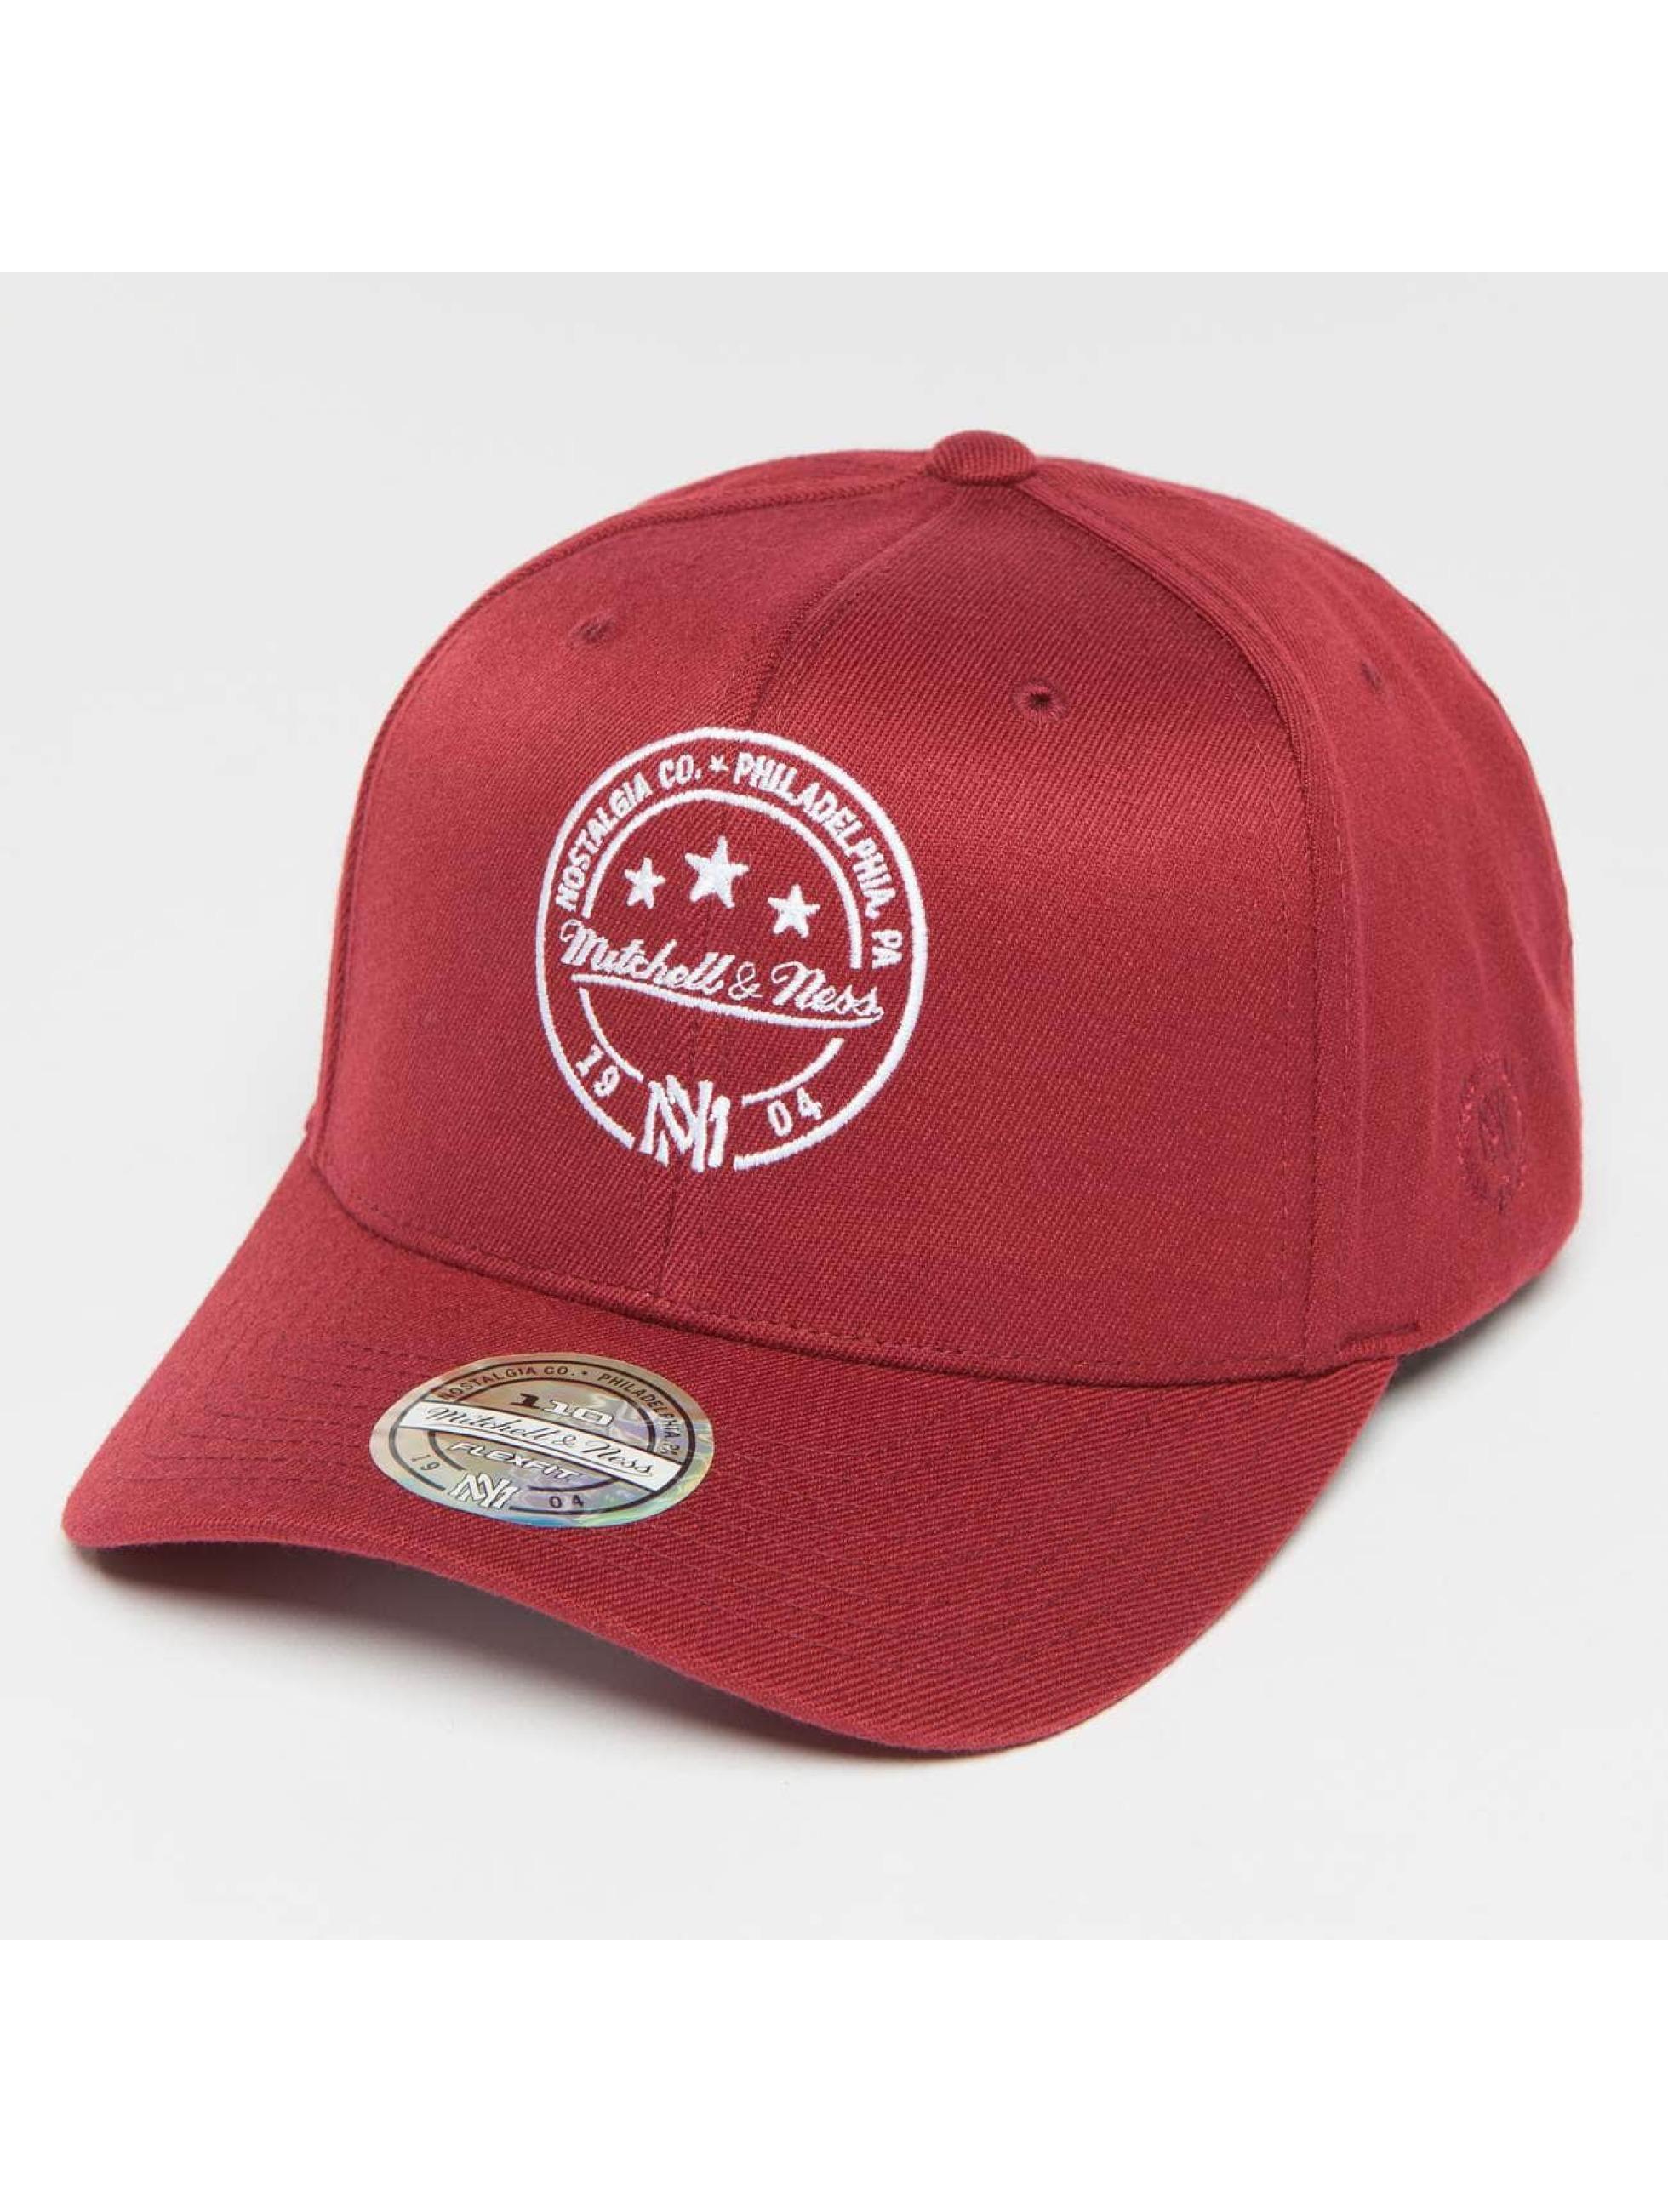 Mitchell & Ness Snapback Caps The Burgundy 2-Tone Visor Sticker 110 punainen